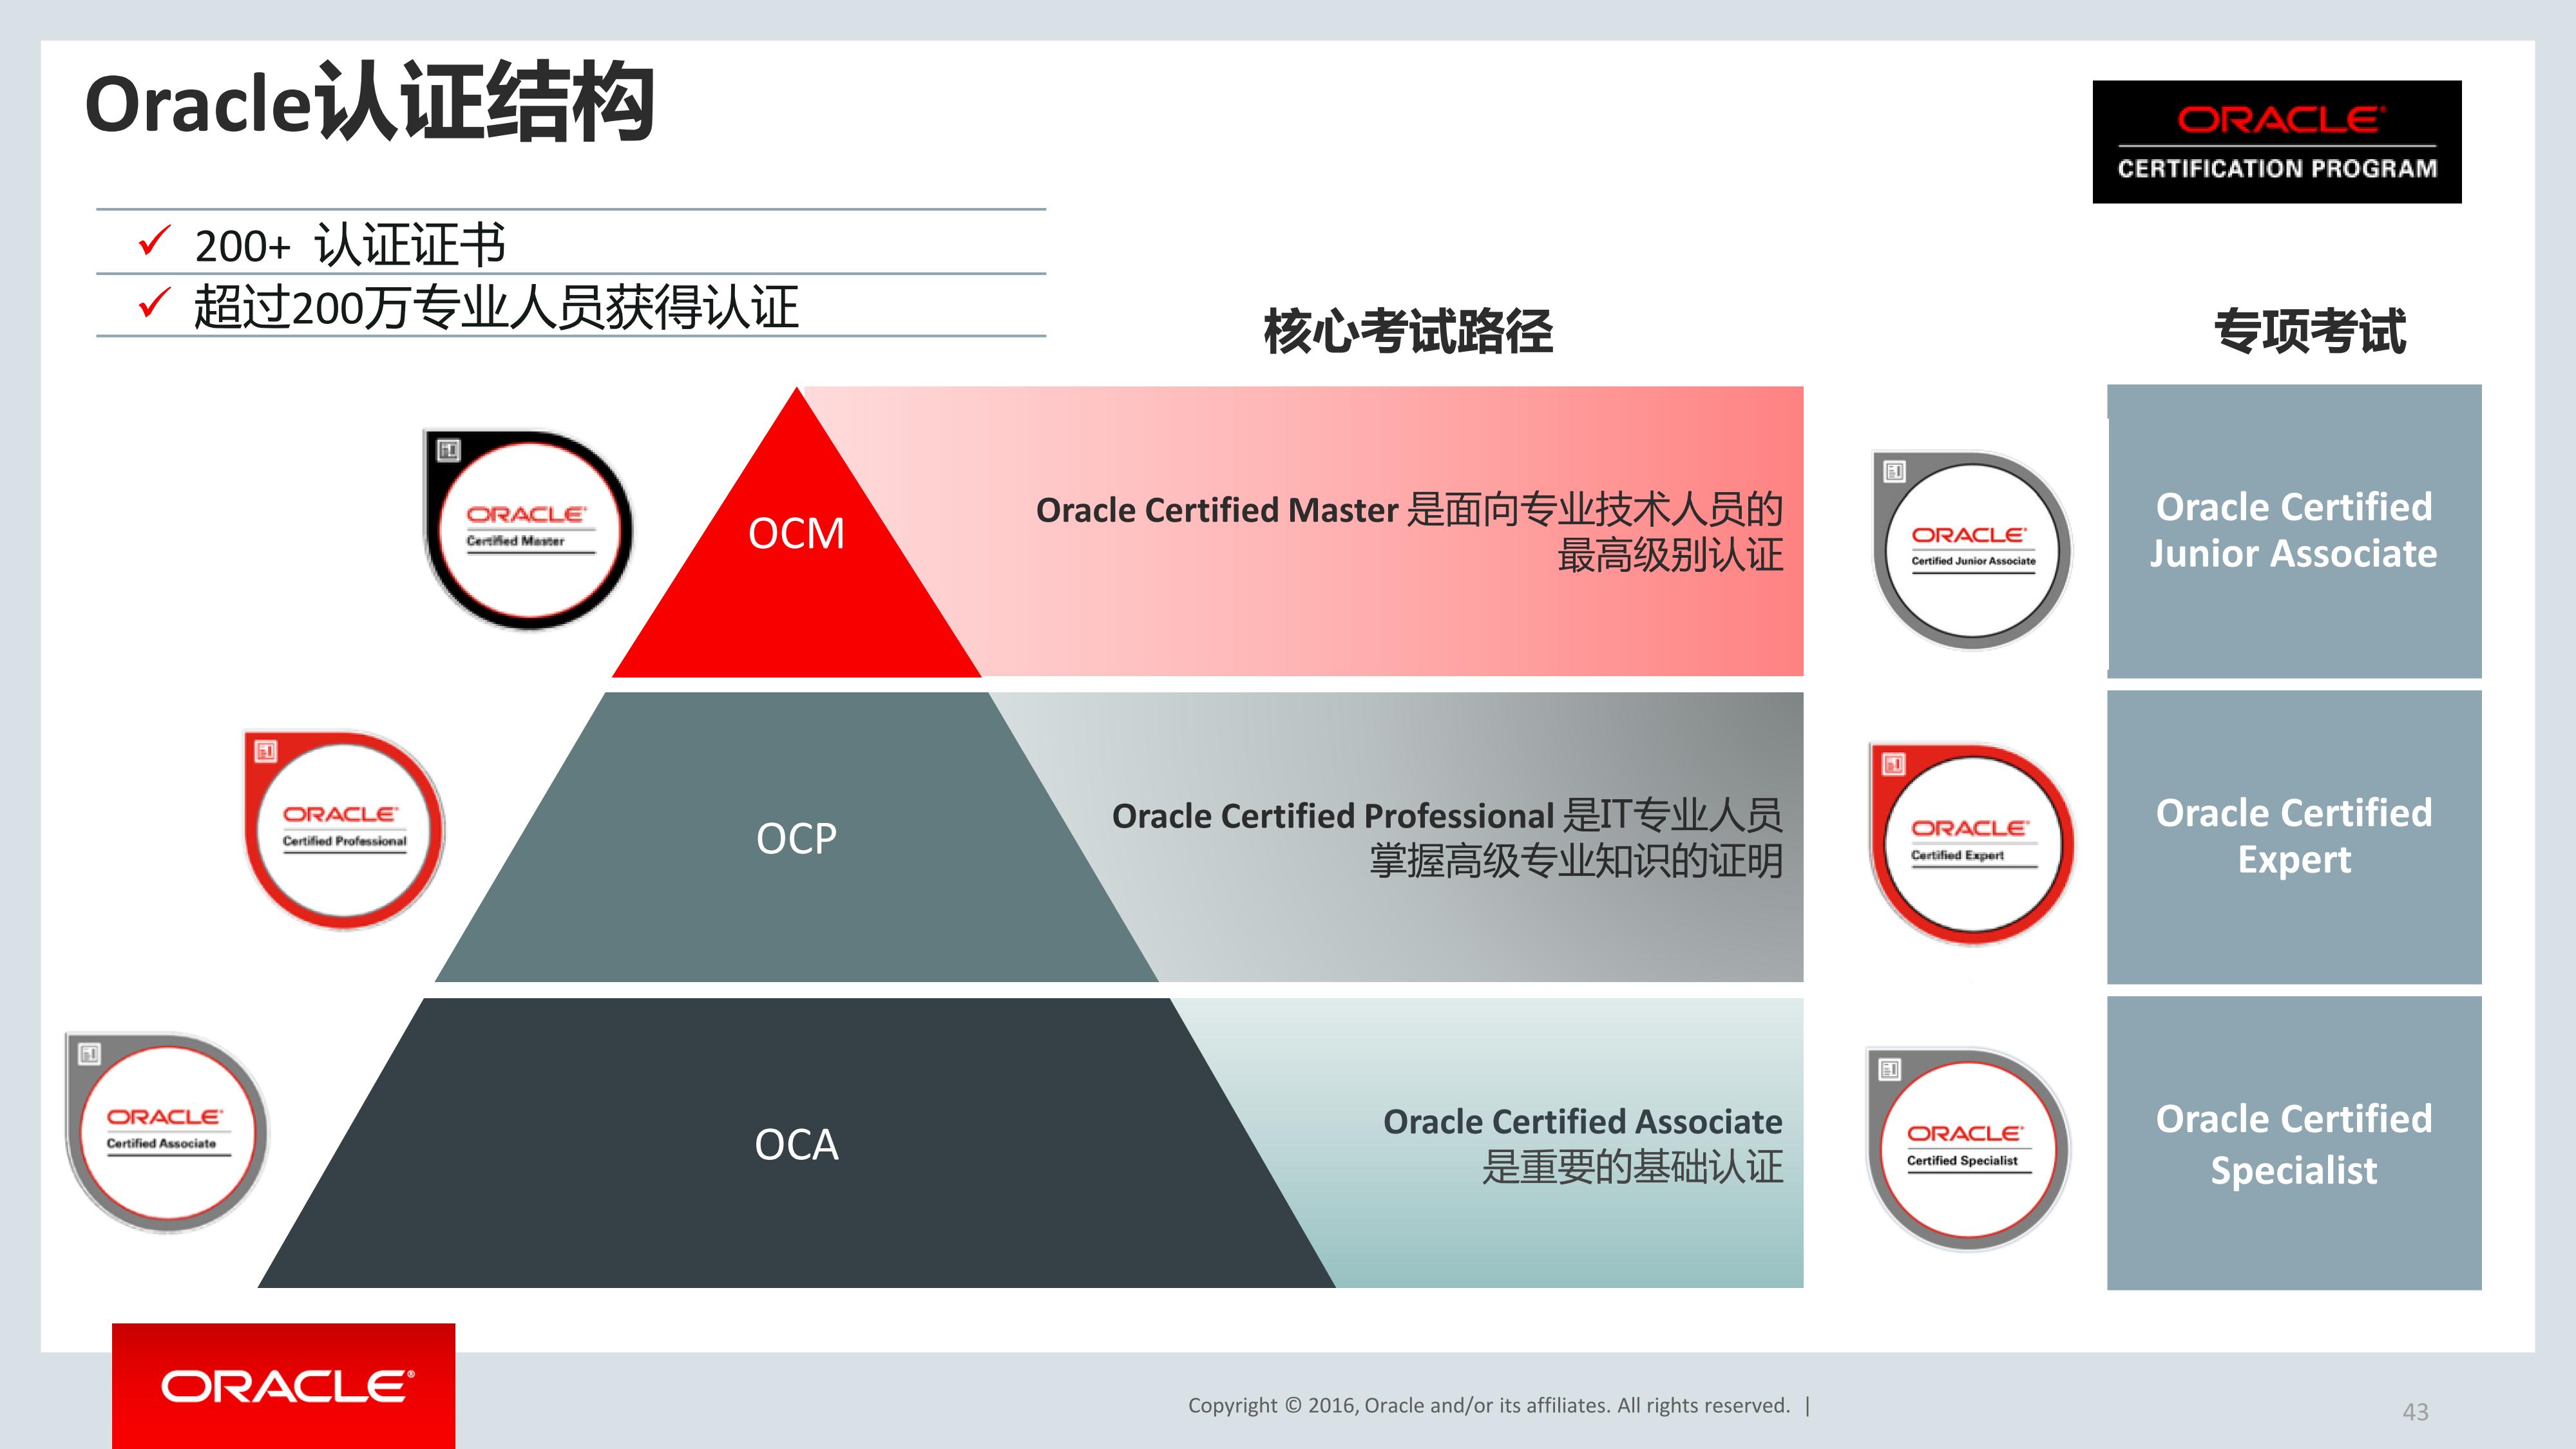 OracleWDP教育项目介绍_04